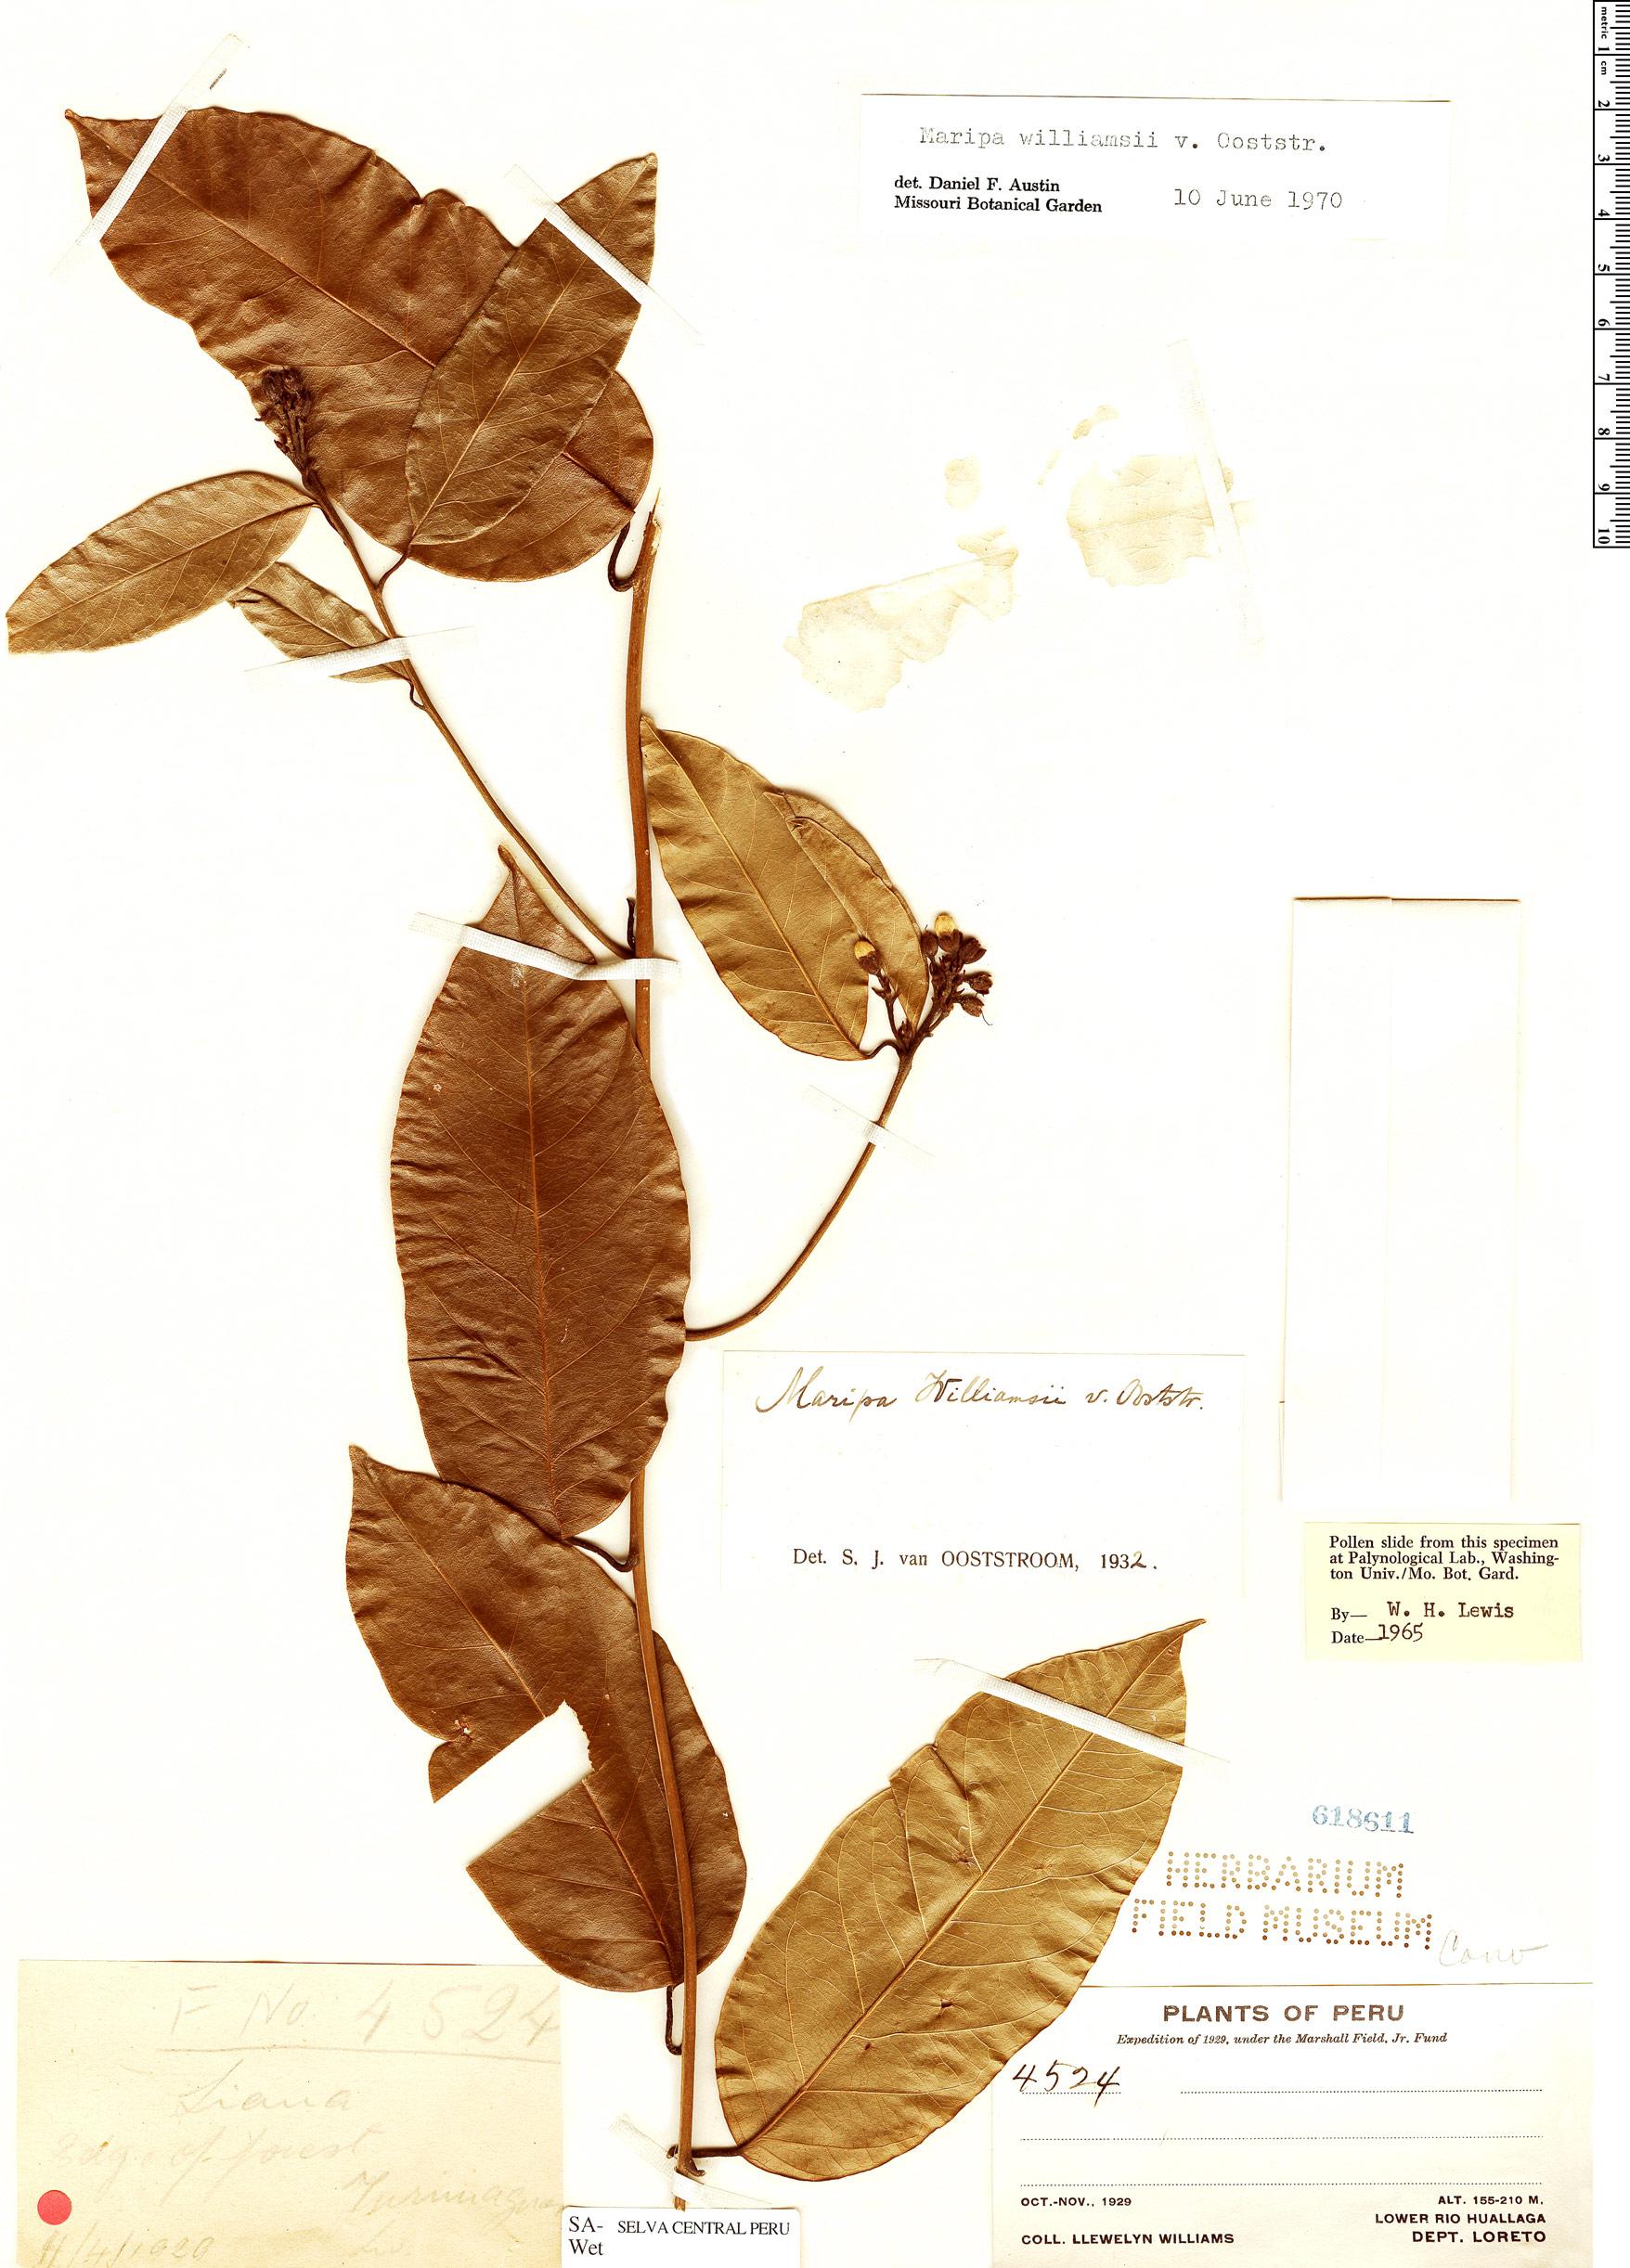 Specimen: Maripa williamsii